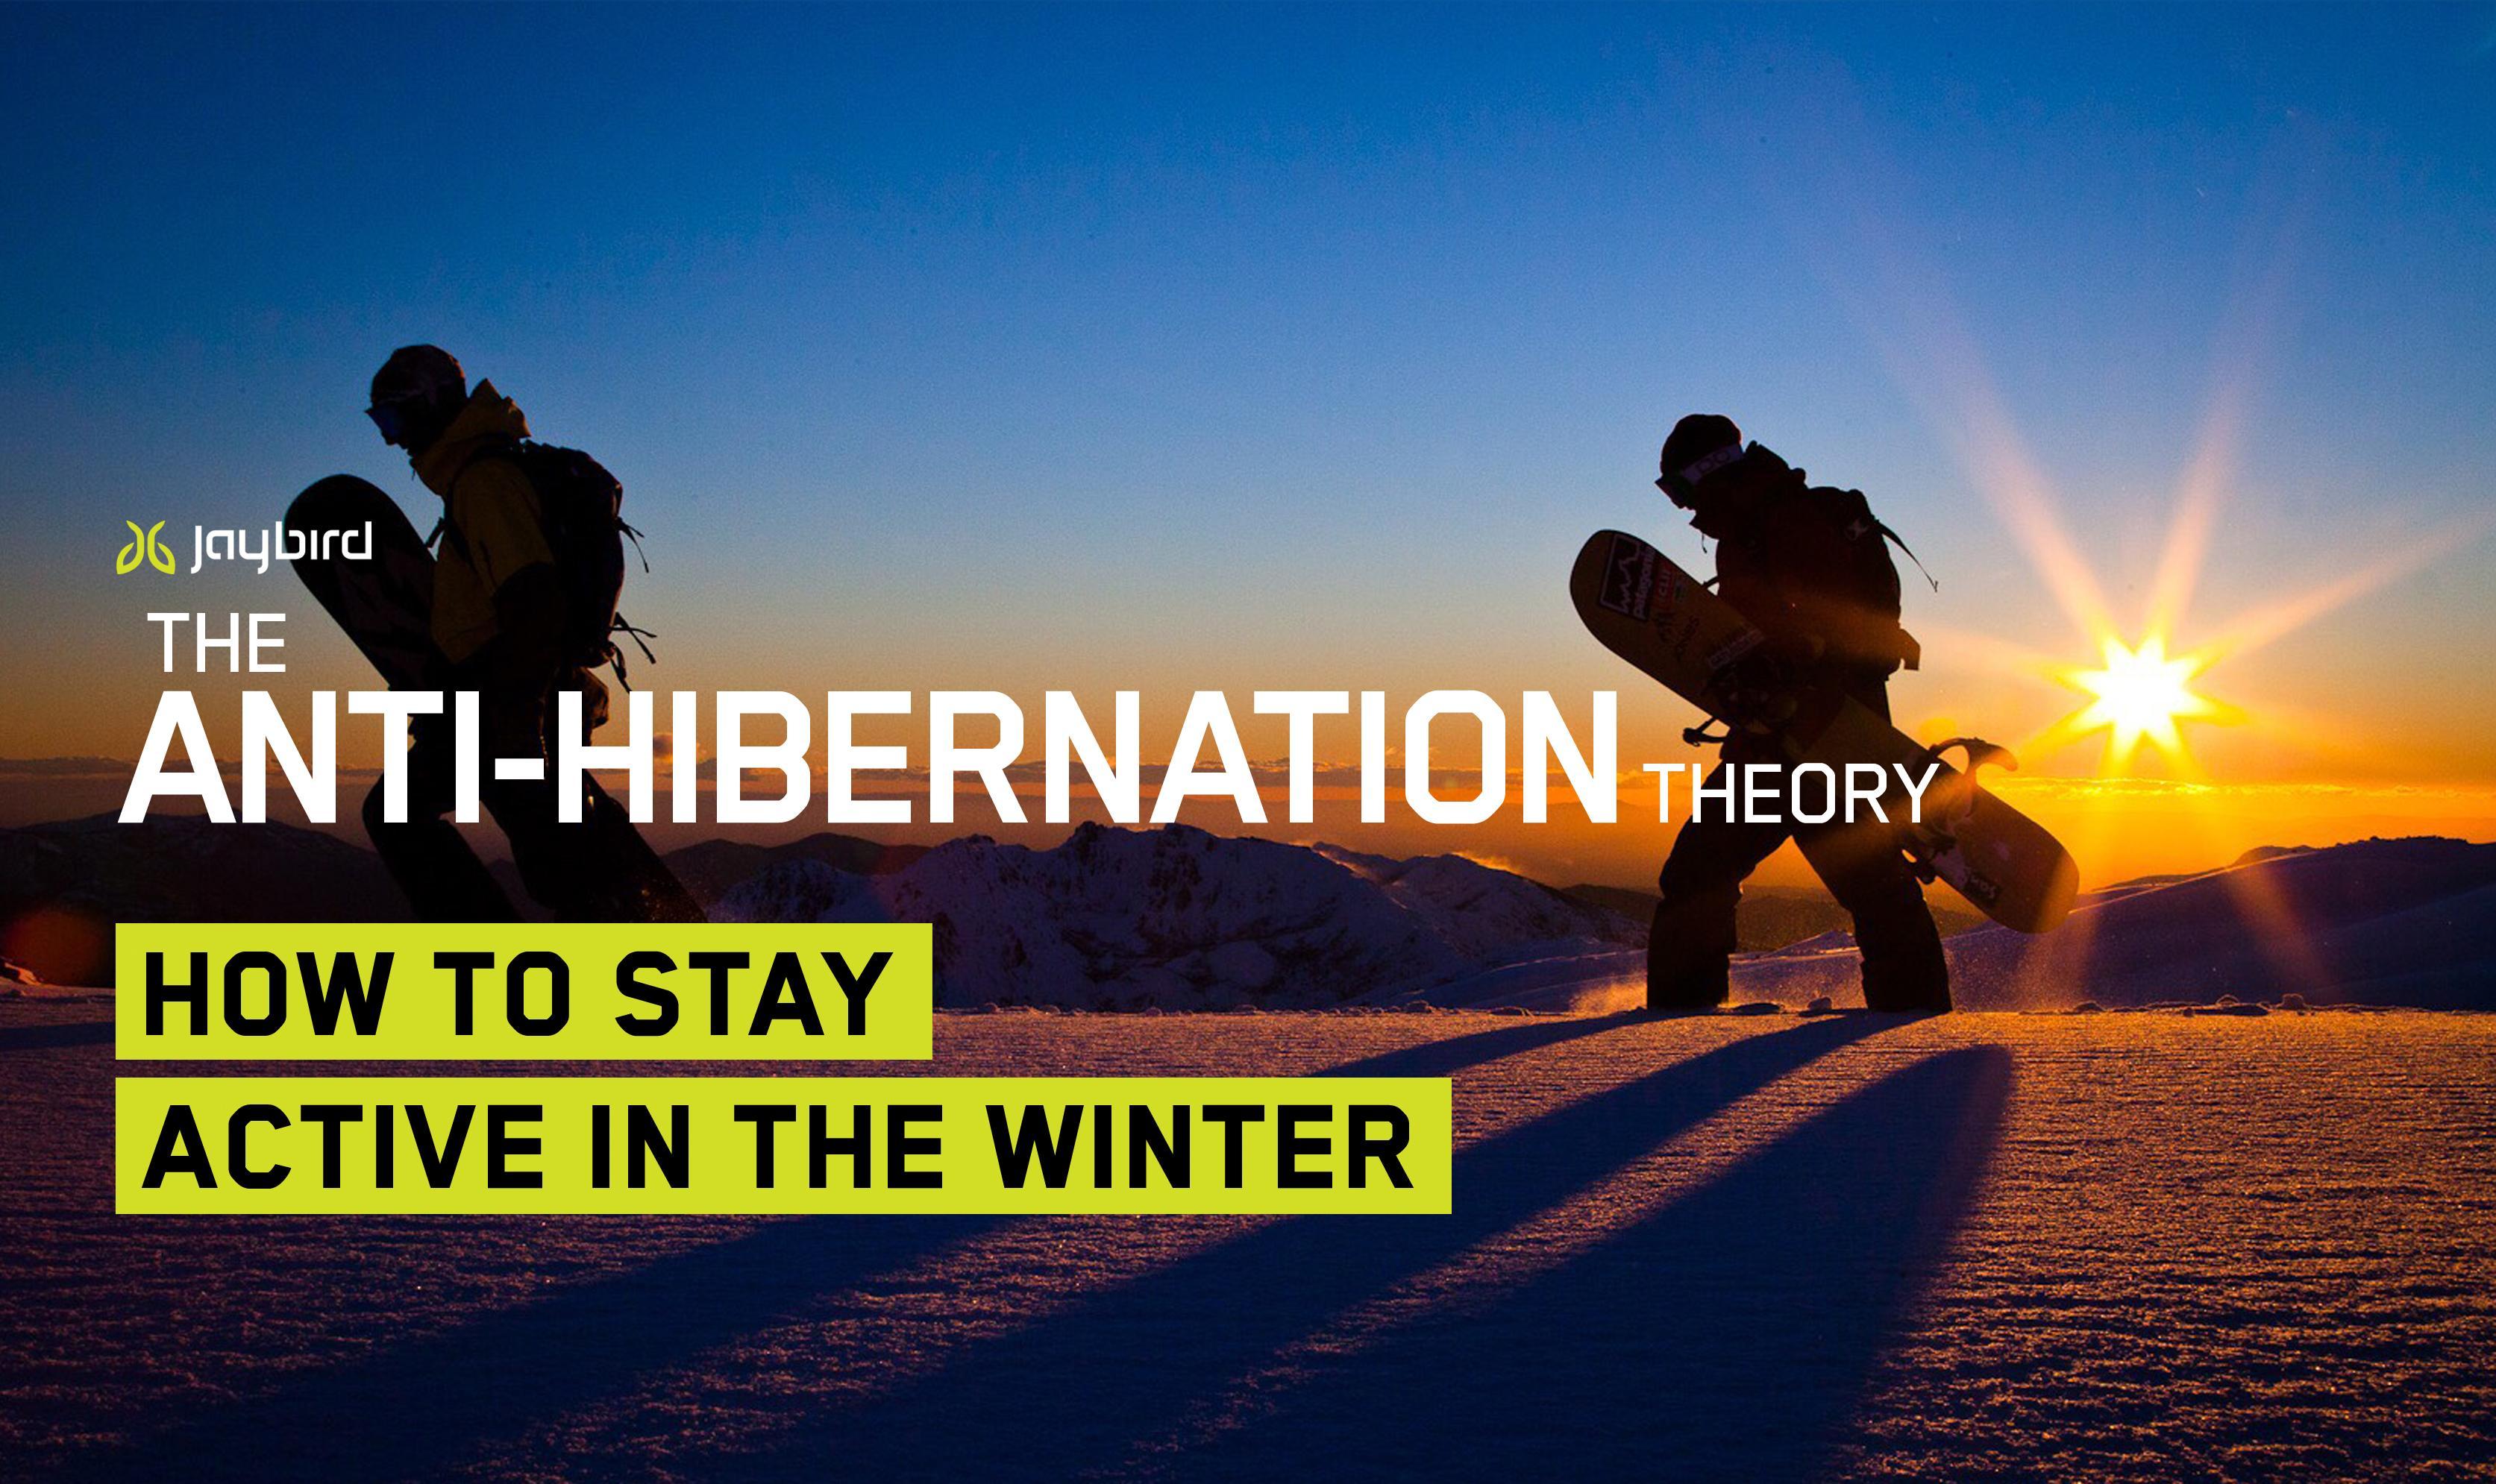 jaybird-sport-blog-anti-hibernation-theory-image-20161122